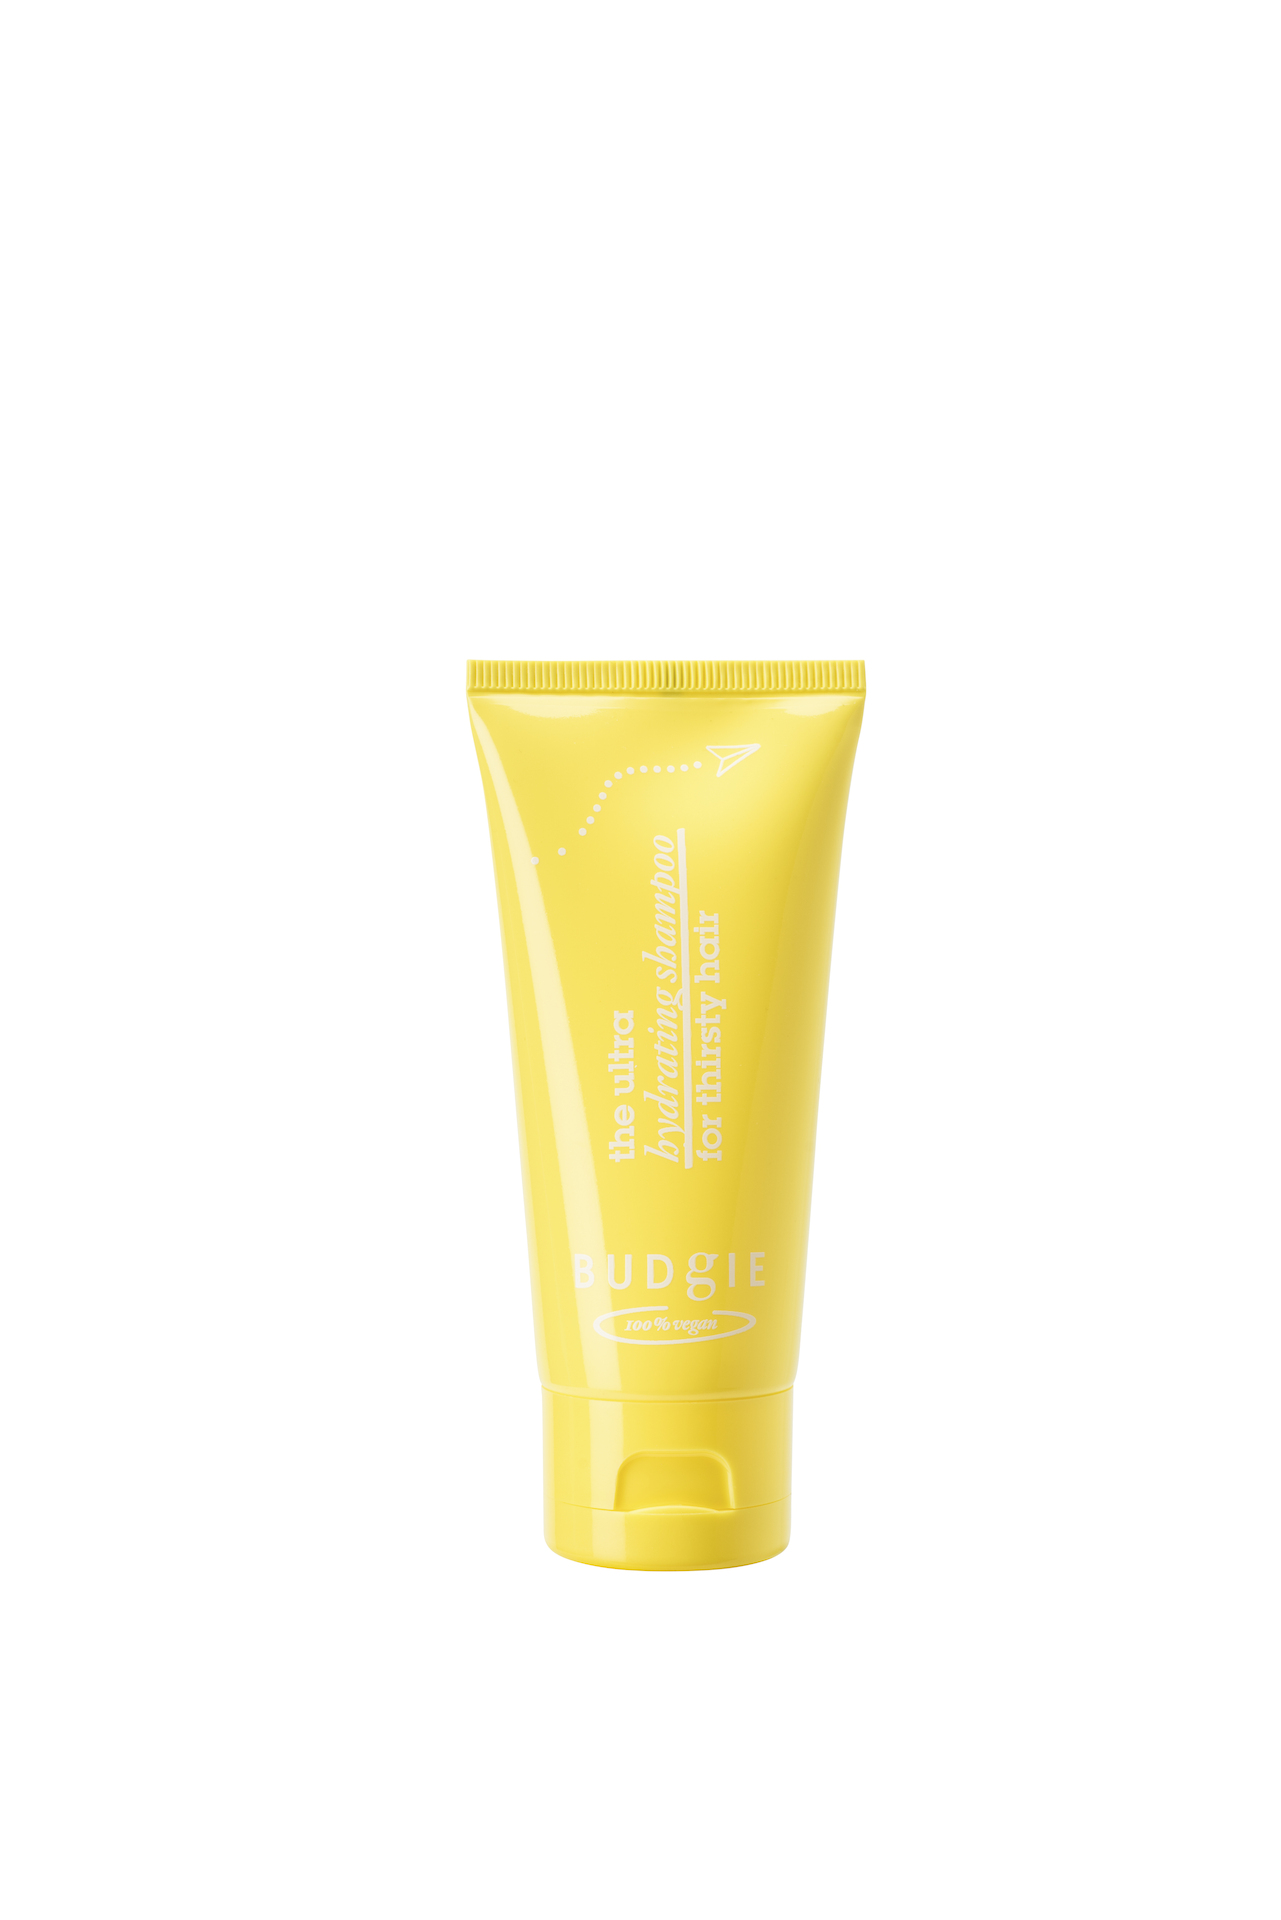 The Mini Hydrating Shampoo 60ml